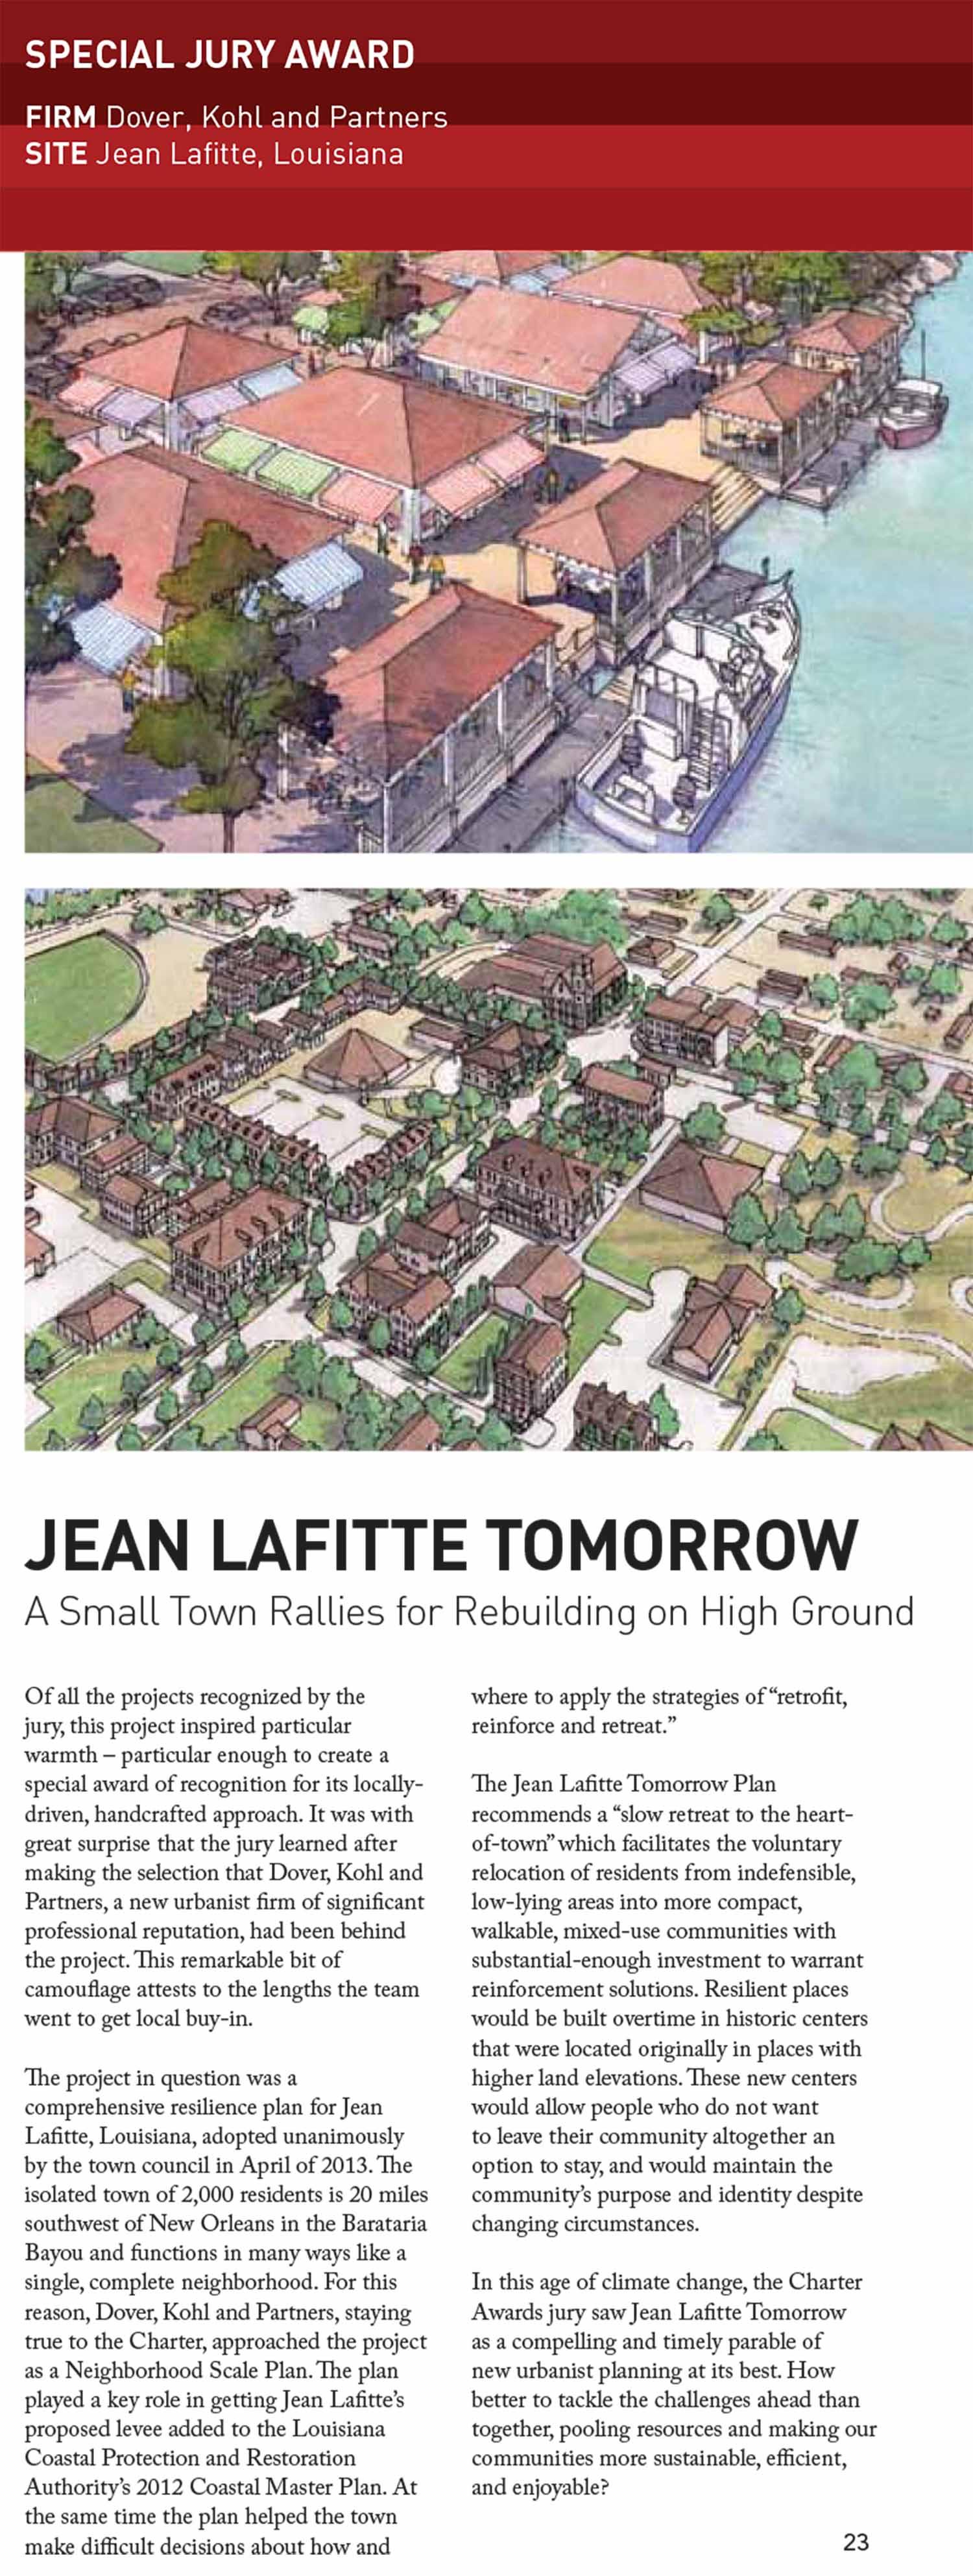 2014-Special Jury CNU Charter Award- Jean Lafitte Tomorrow Resilience Plan.jpg